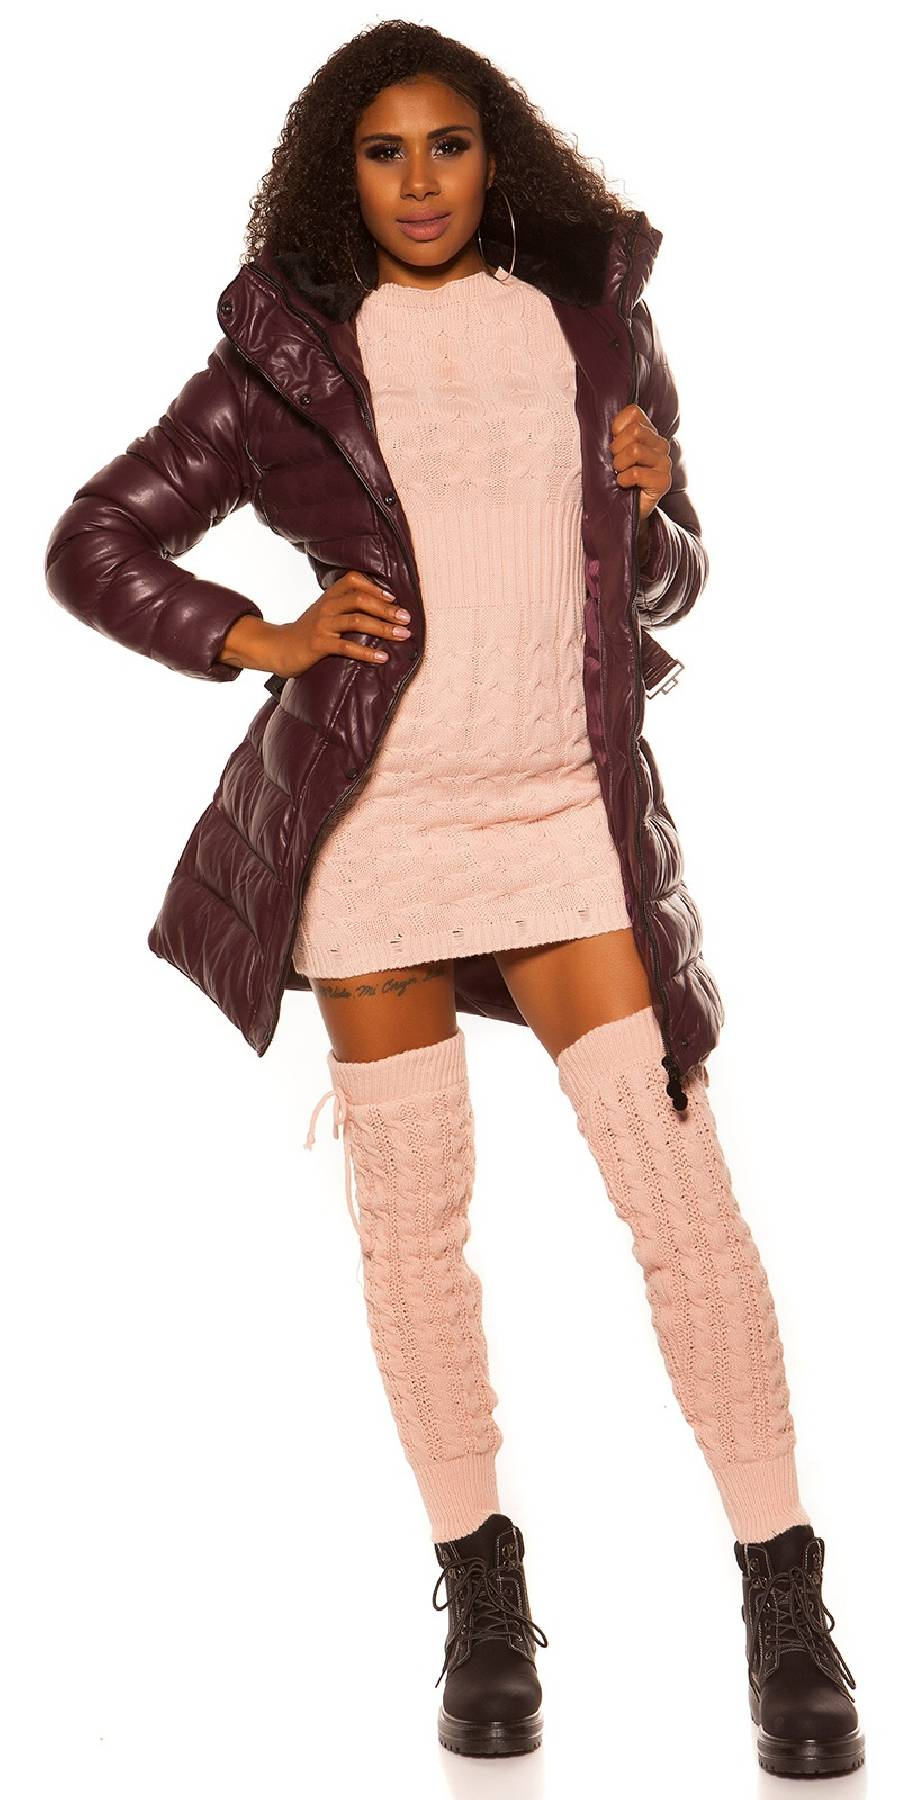 Vêtement femme robe sexy gogo ALDONA couleur fushia